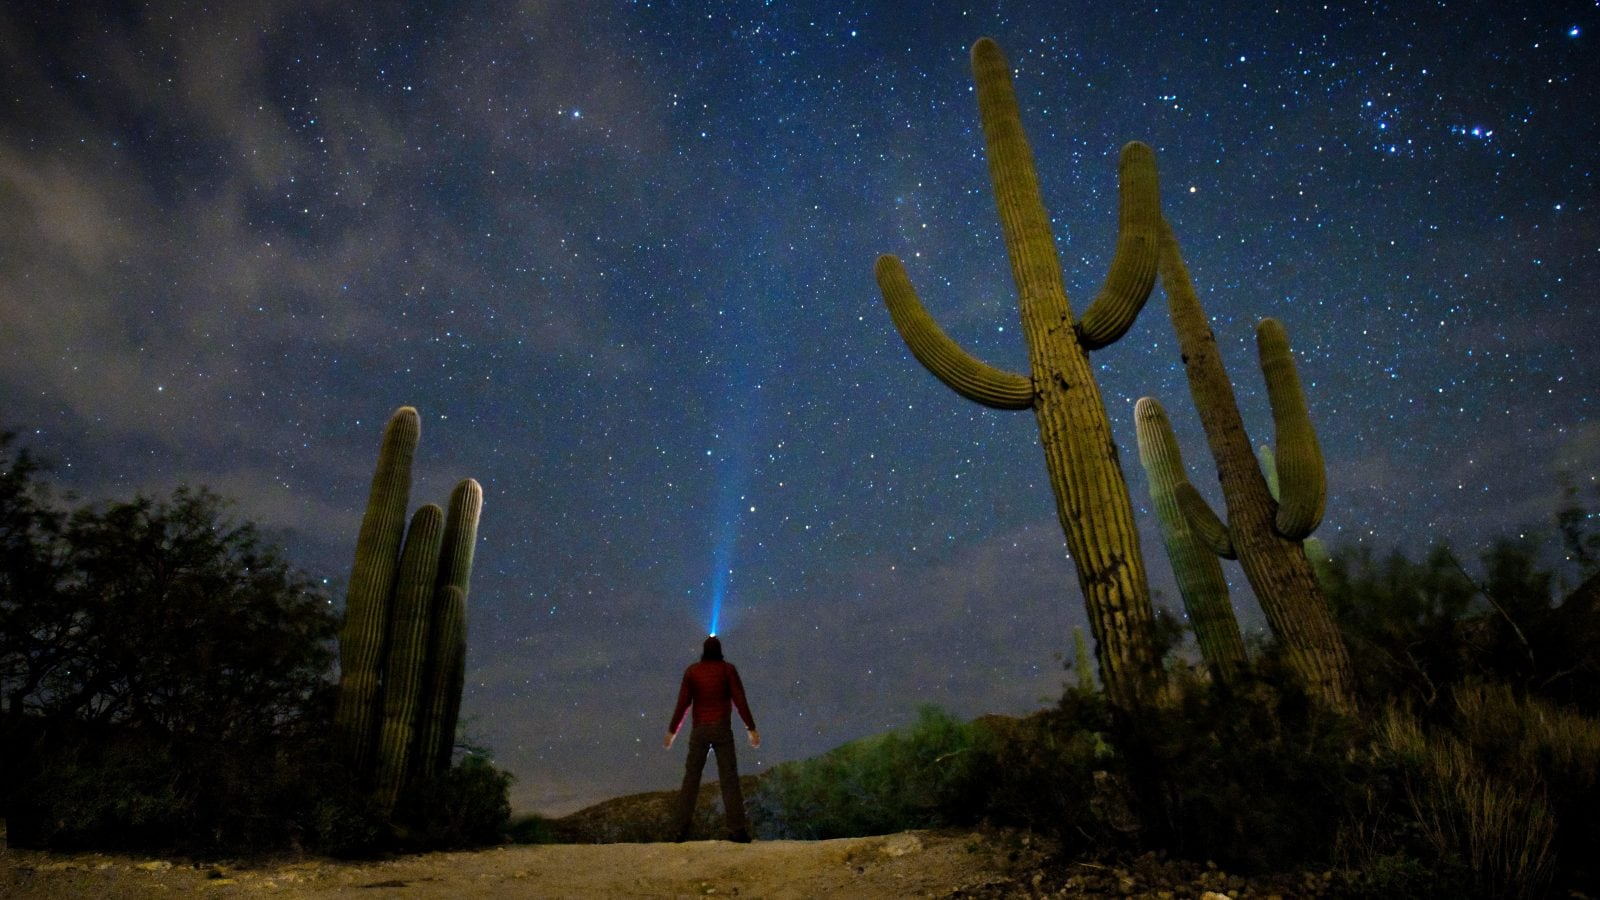 Night Sky shot with Starry AF